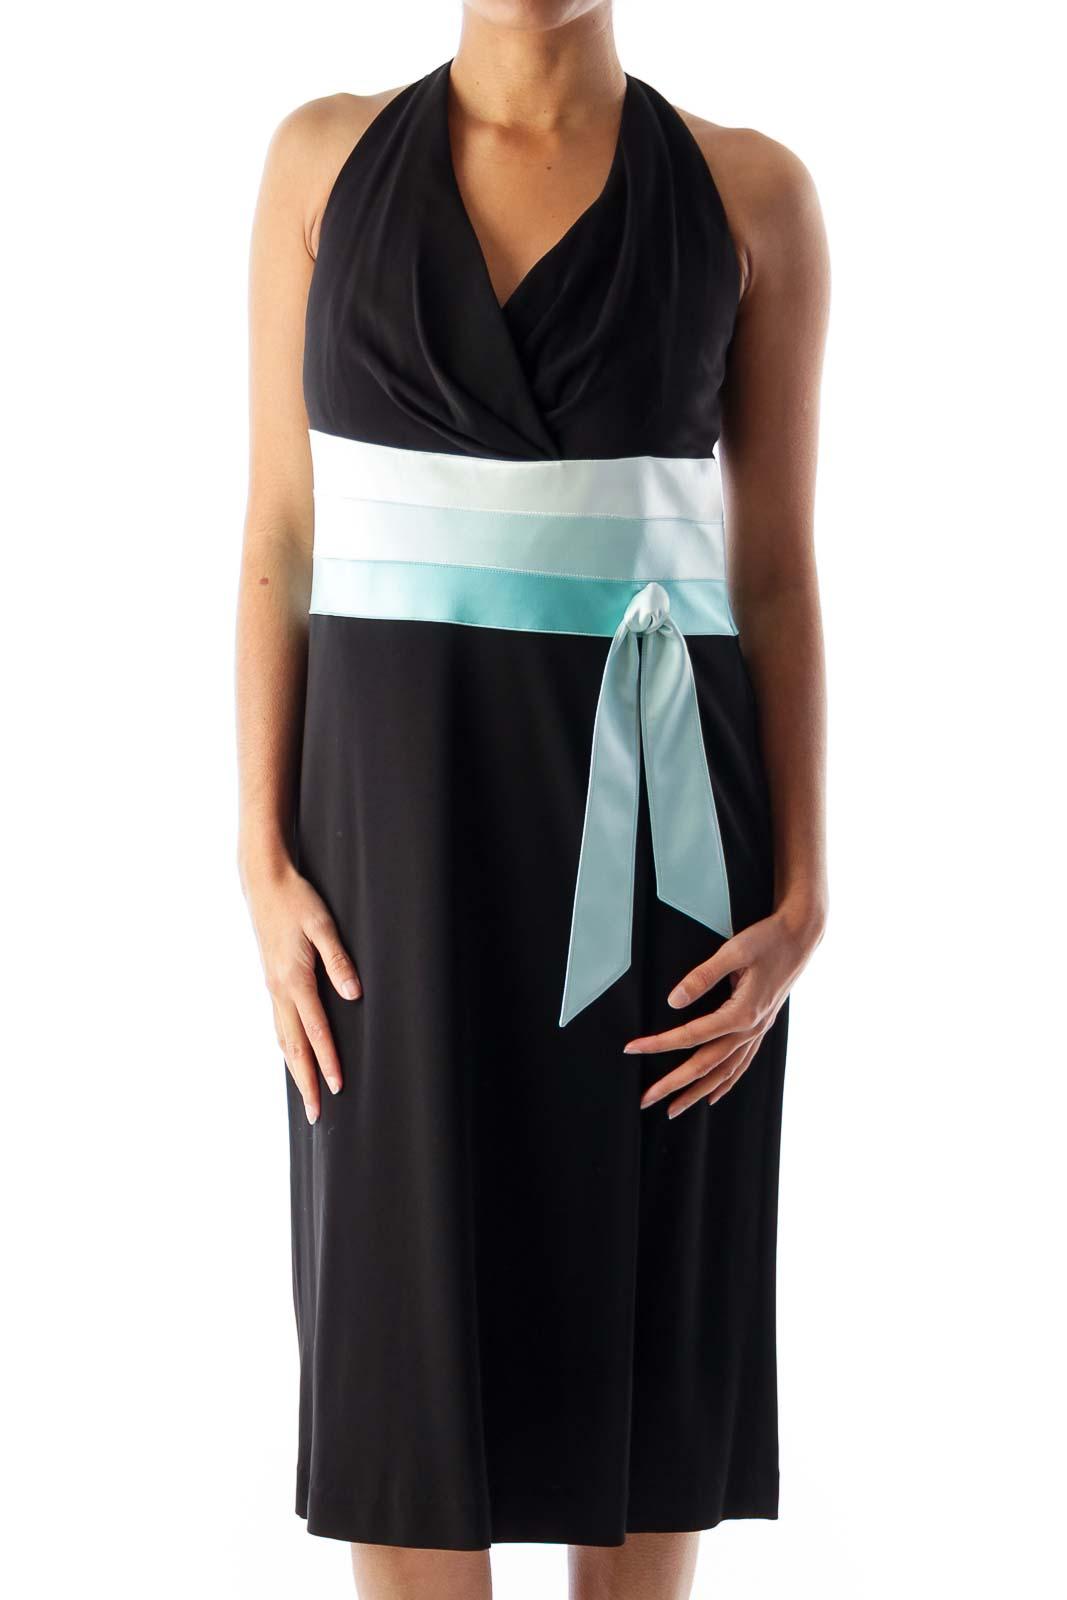 Black & Blue Color Block Dress Front